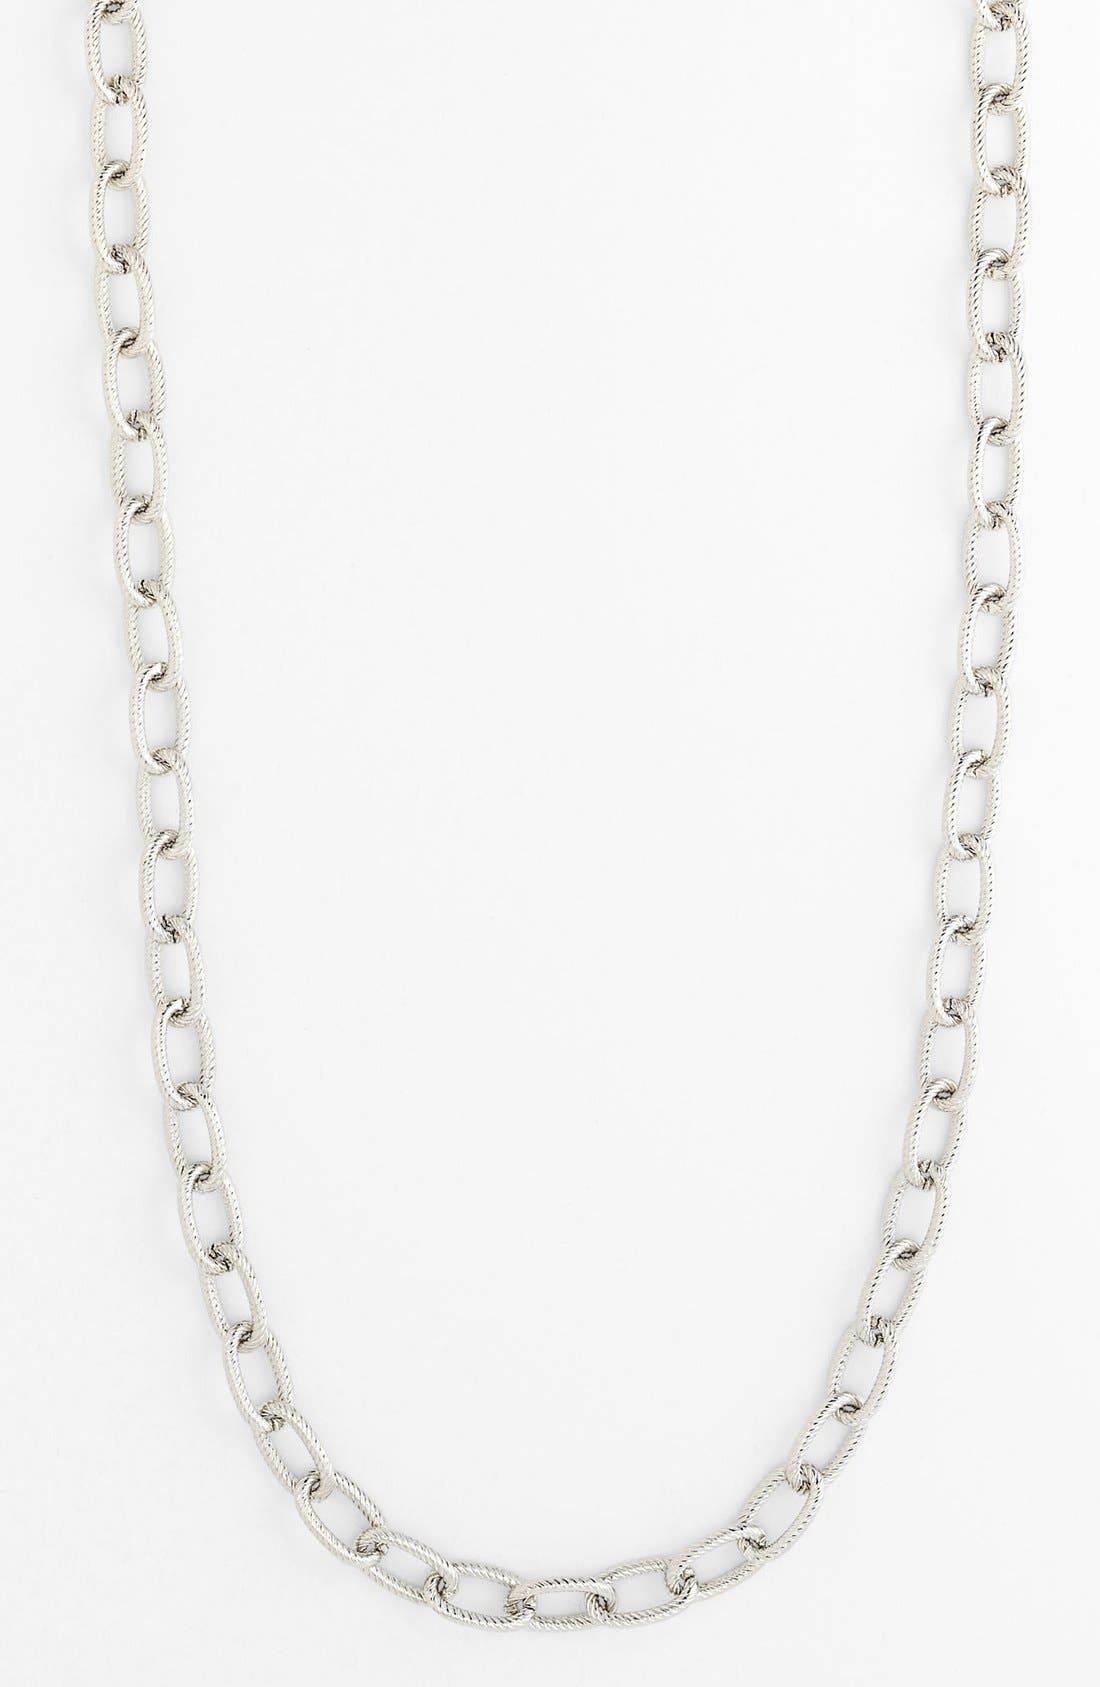 Main Image - Nordstrom Long Link Necklace